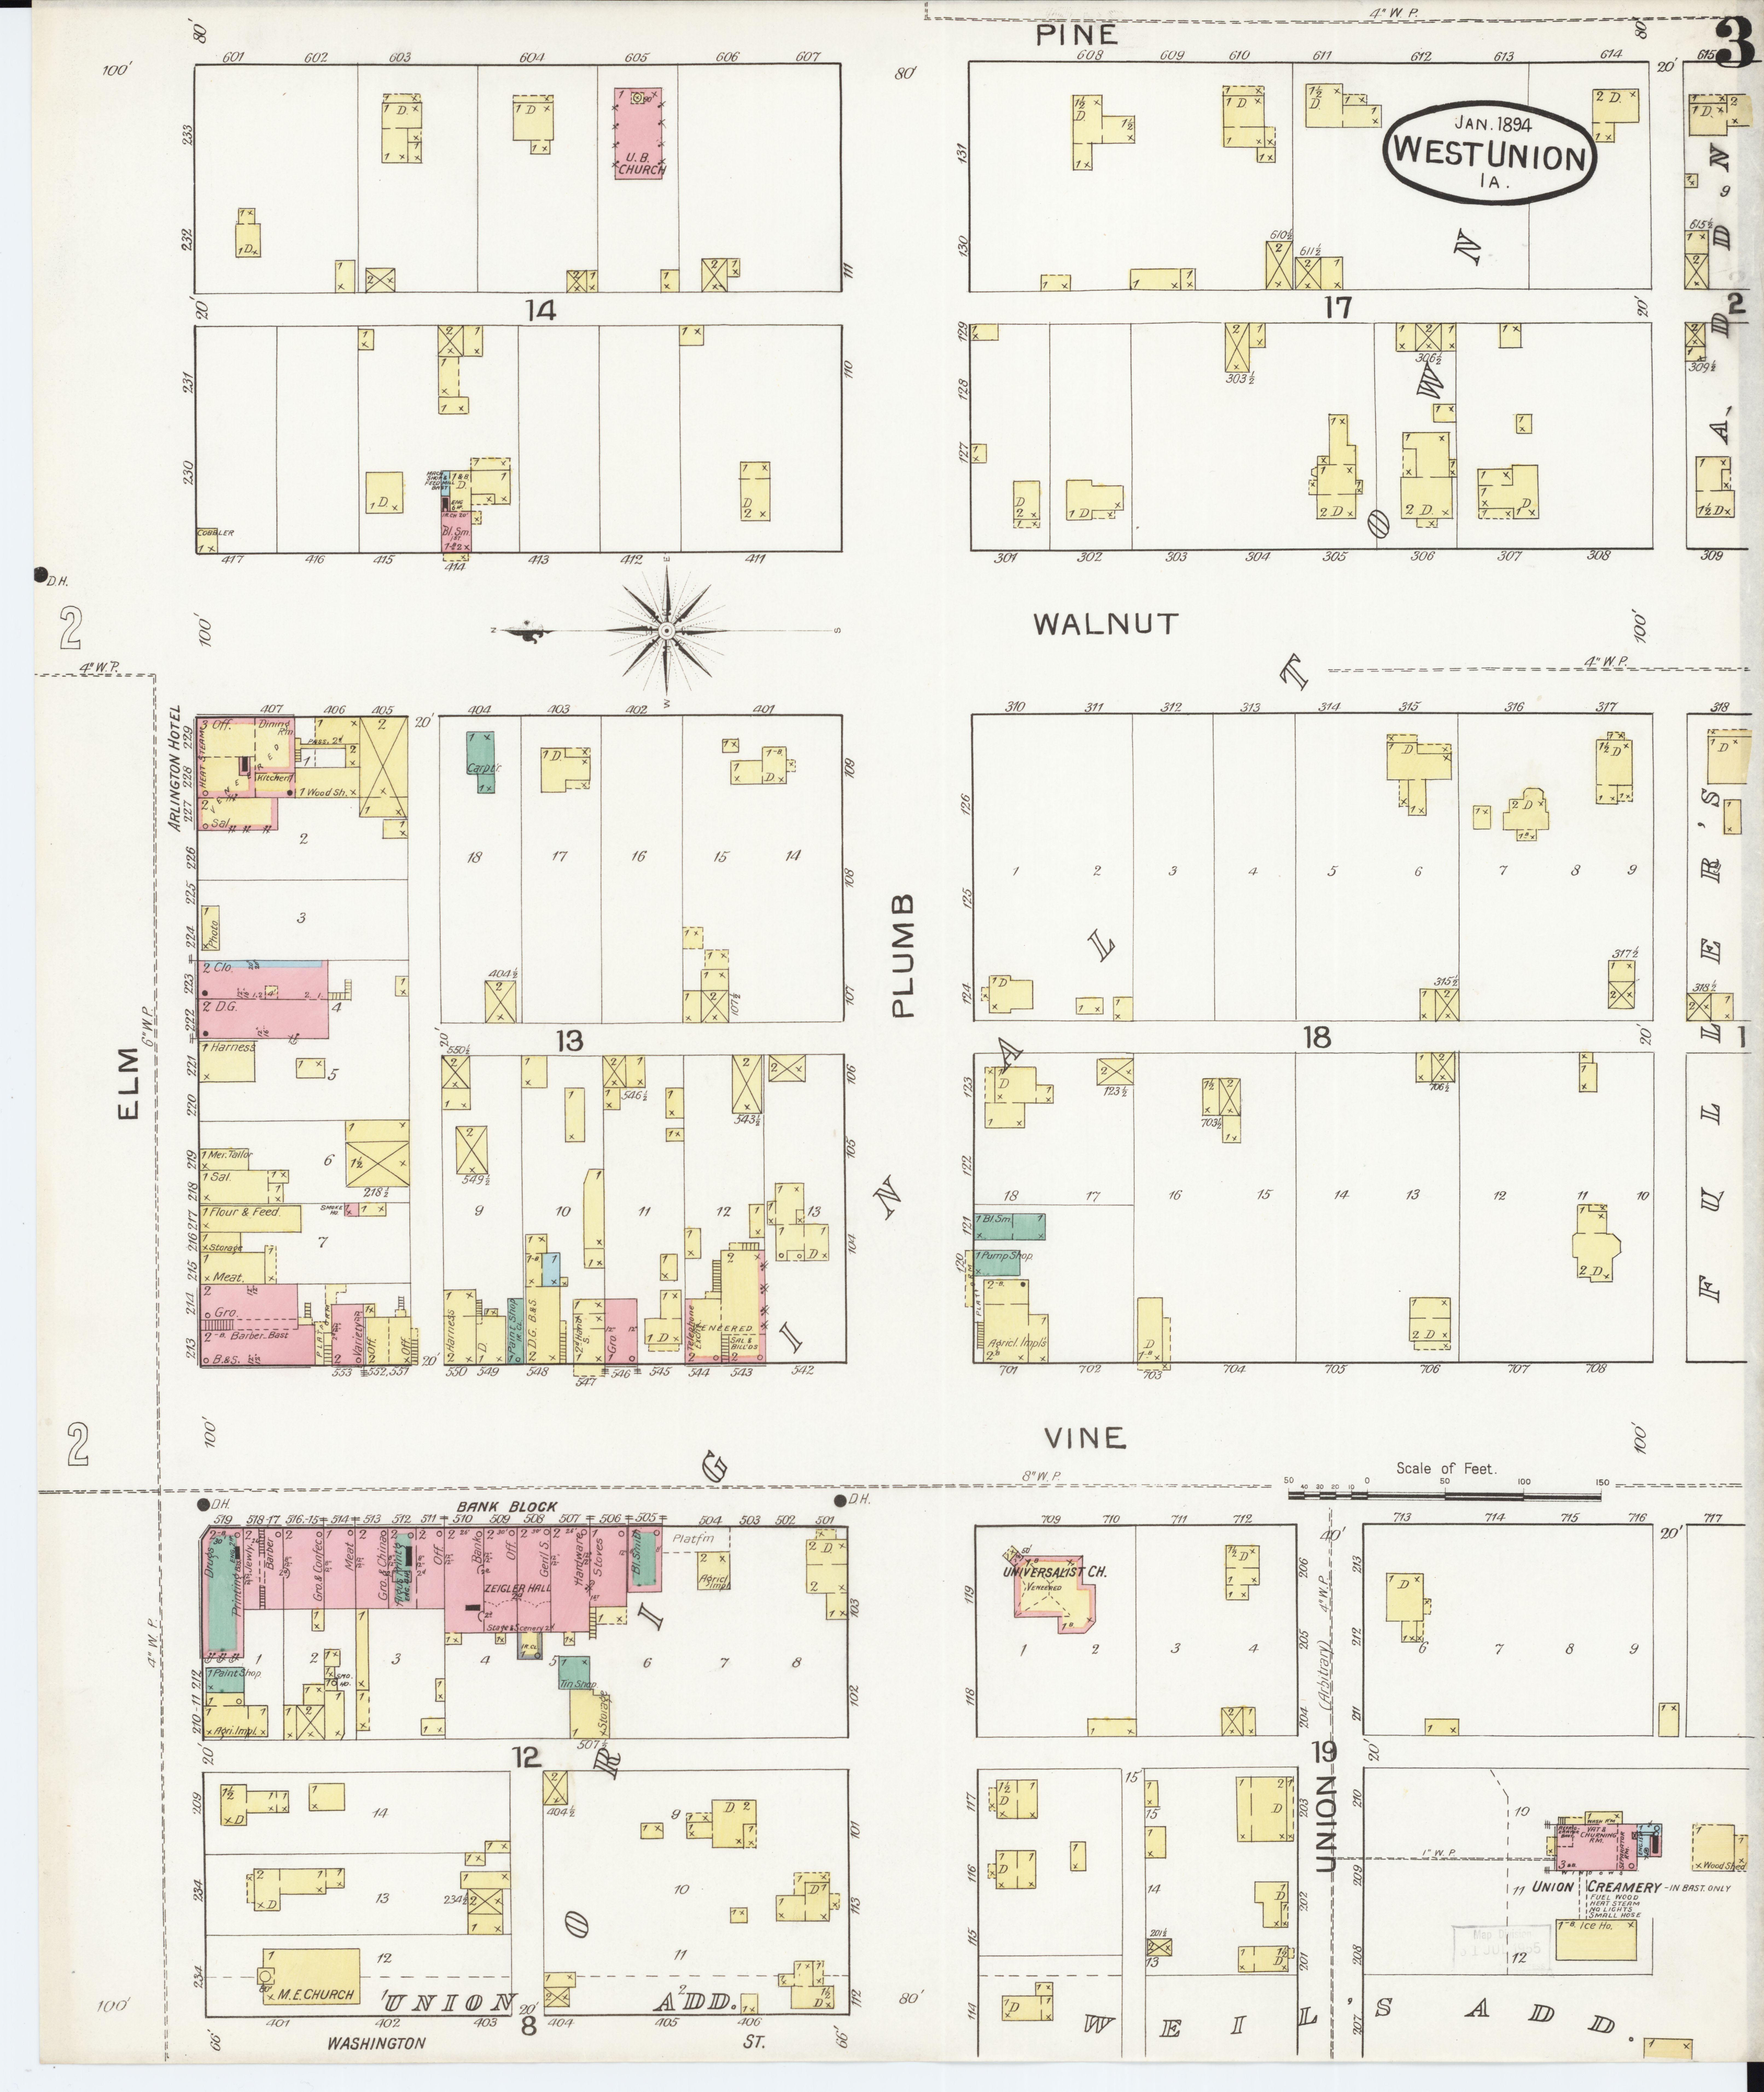 Fayette Iowa Map.File Sanborn Fire Insurance Map From West Union Fayette County